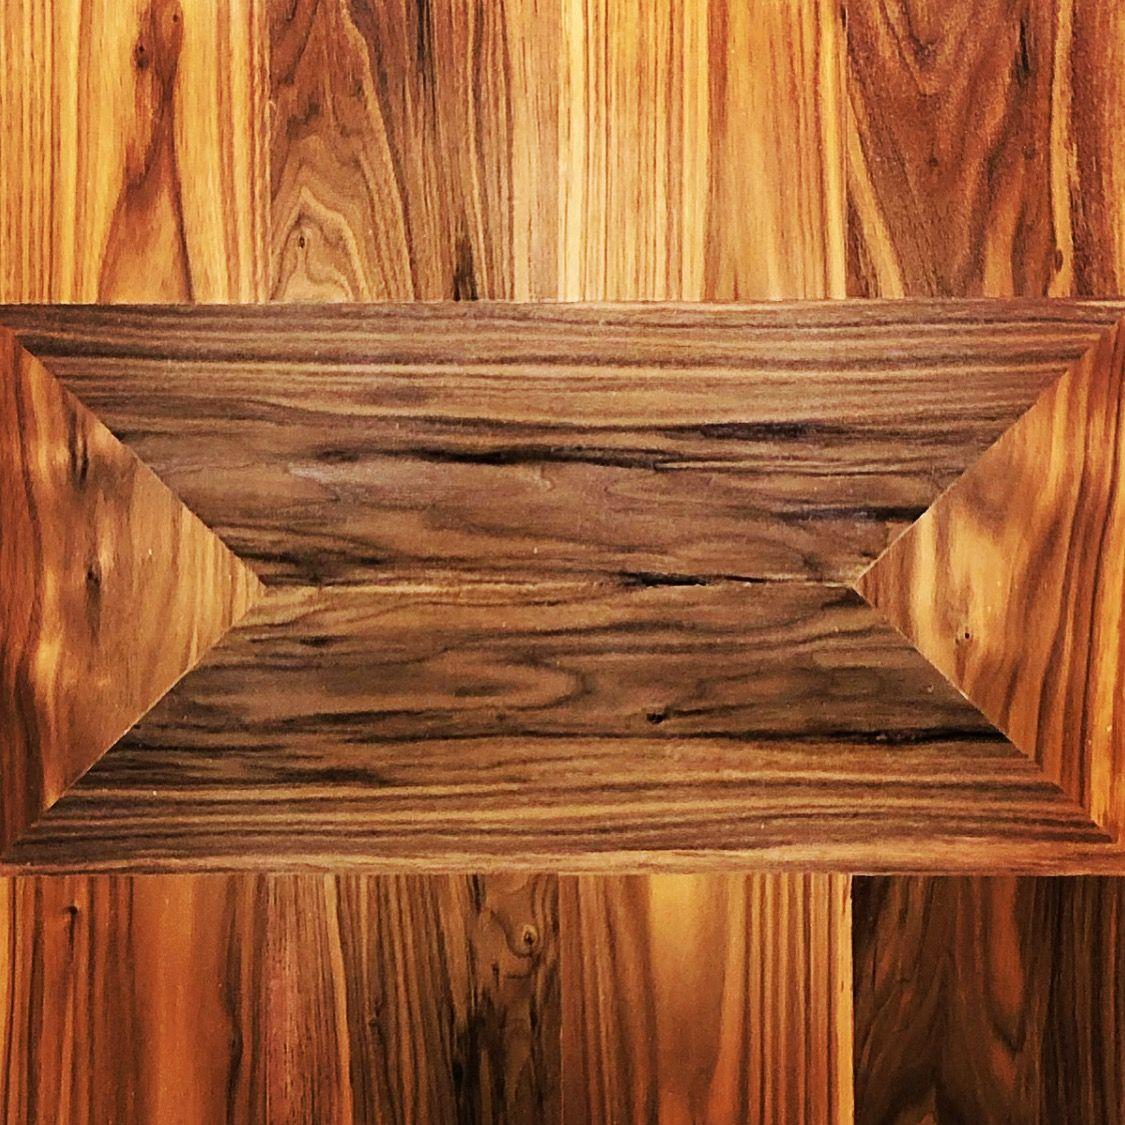 Walnut Bow Tie Inlay Desk Top Real Wood Furniture Wood Wood Logs